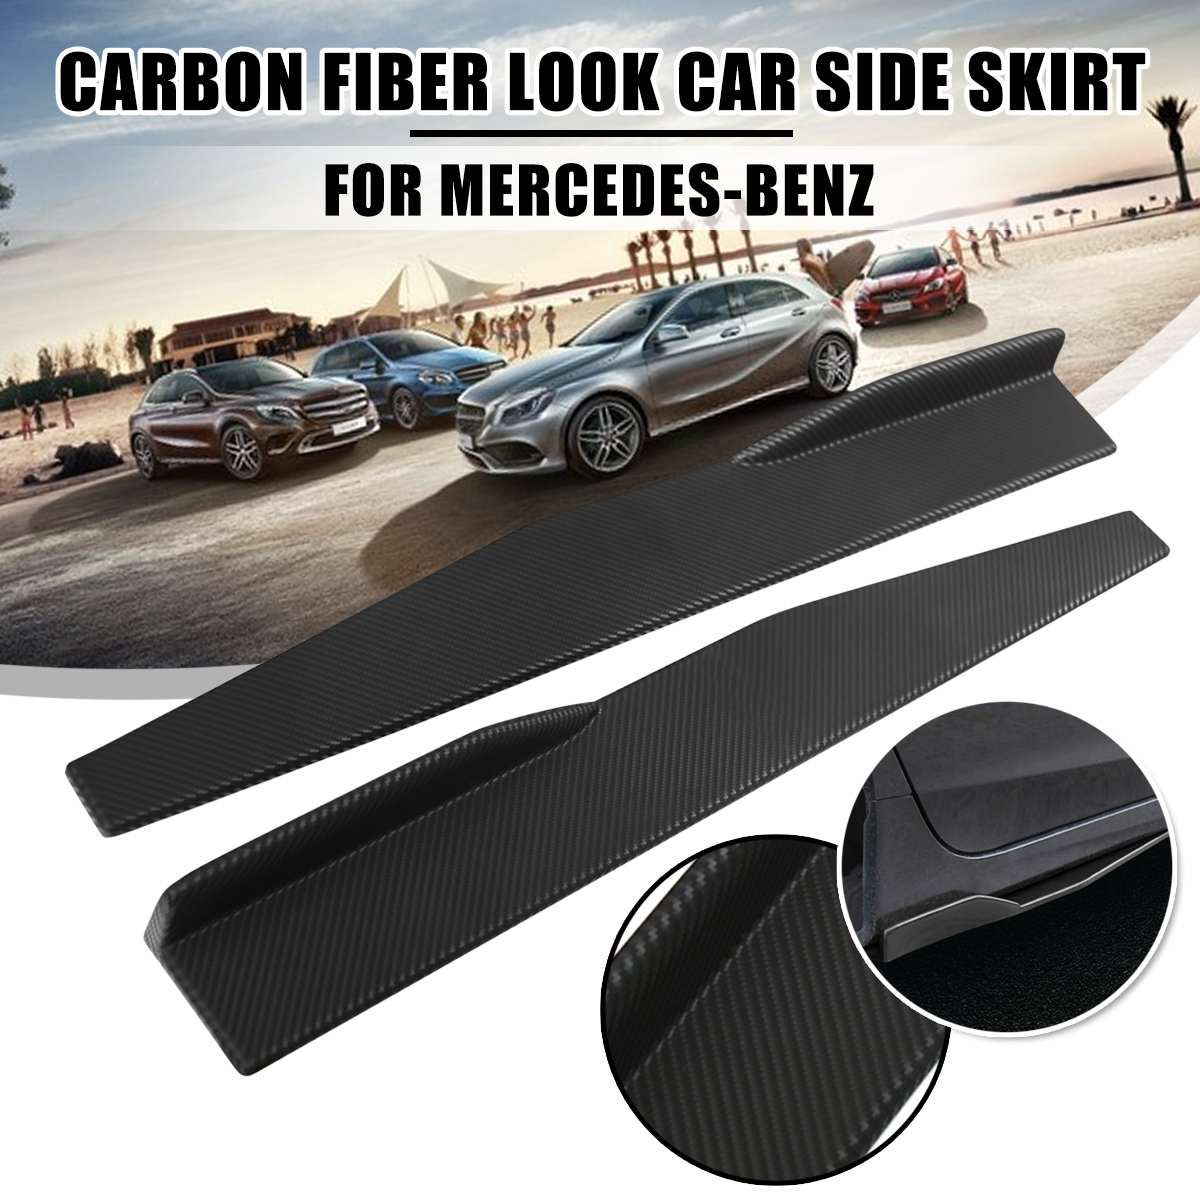 1 par con apariencia de fibra de carbono Universal para falda lateral de coche s para falda lateral de coche divisores de cohete Winglet alas laterales para Audi para Golf para Lexus